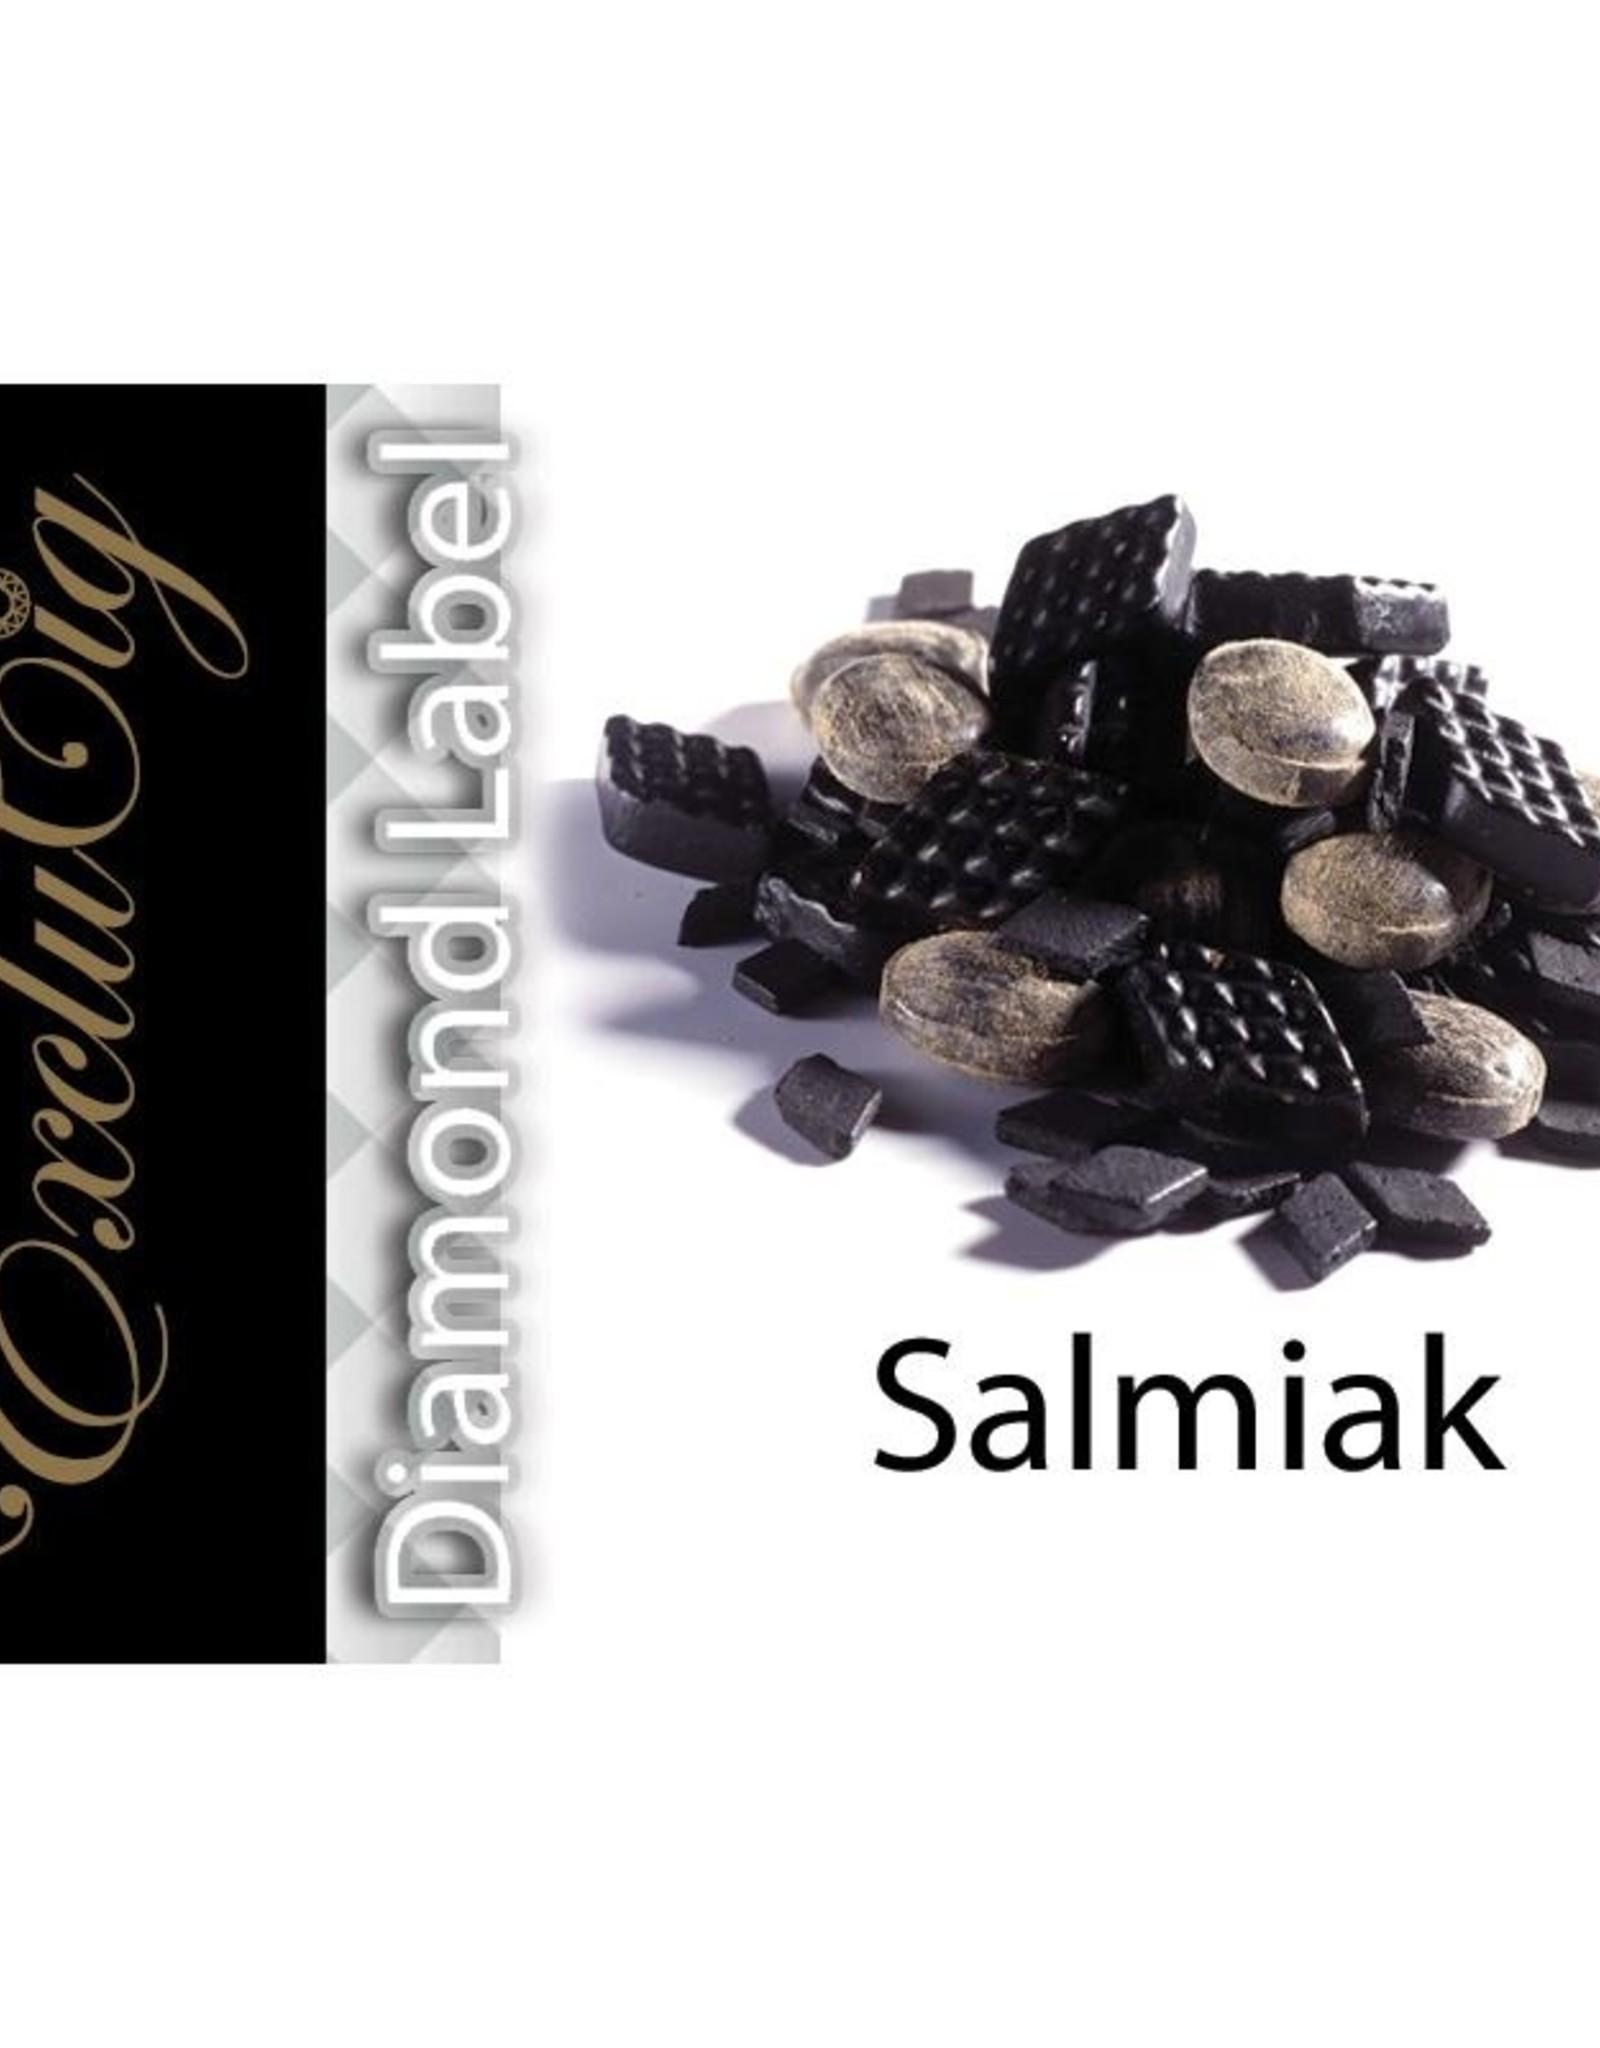 Exclucig Exclucig Diamond Label E-liquid Salmiak 6 mg Nicotine